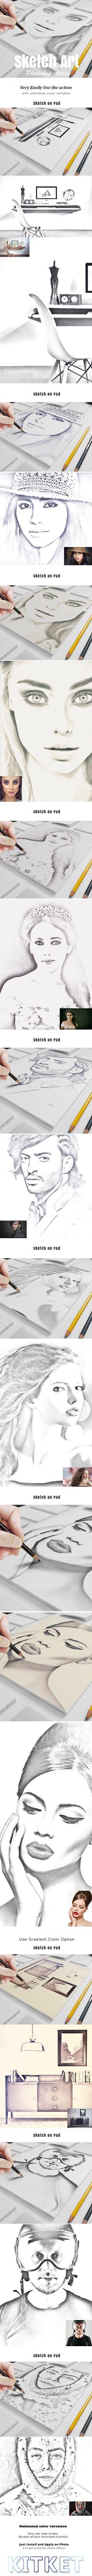 Sketch Art Photo Action